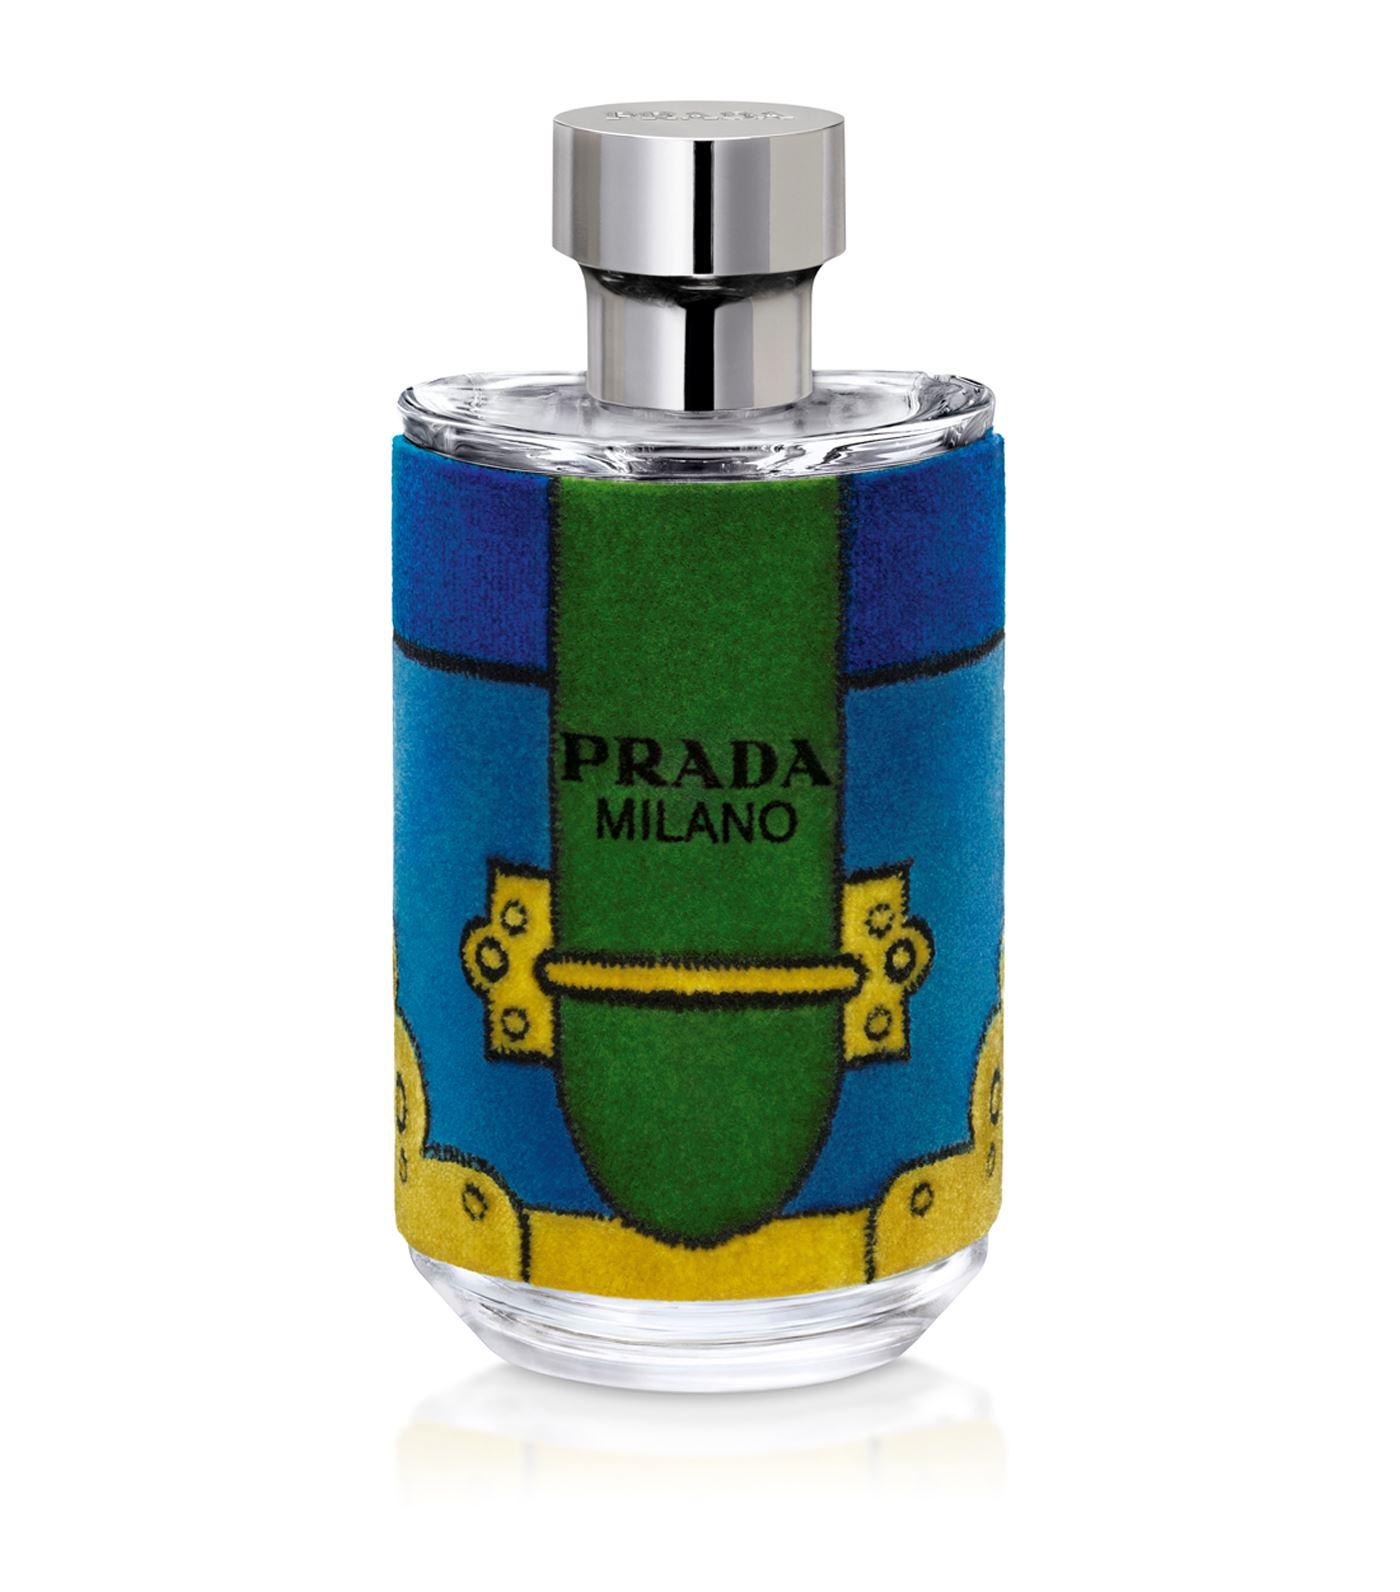 Prada L Homme Velvet Edition Prada одеколон - новий аромат для ... 1b33c2629c11f